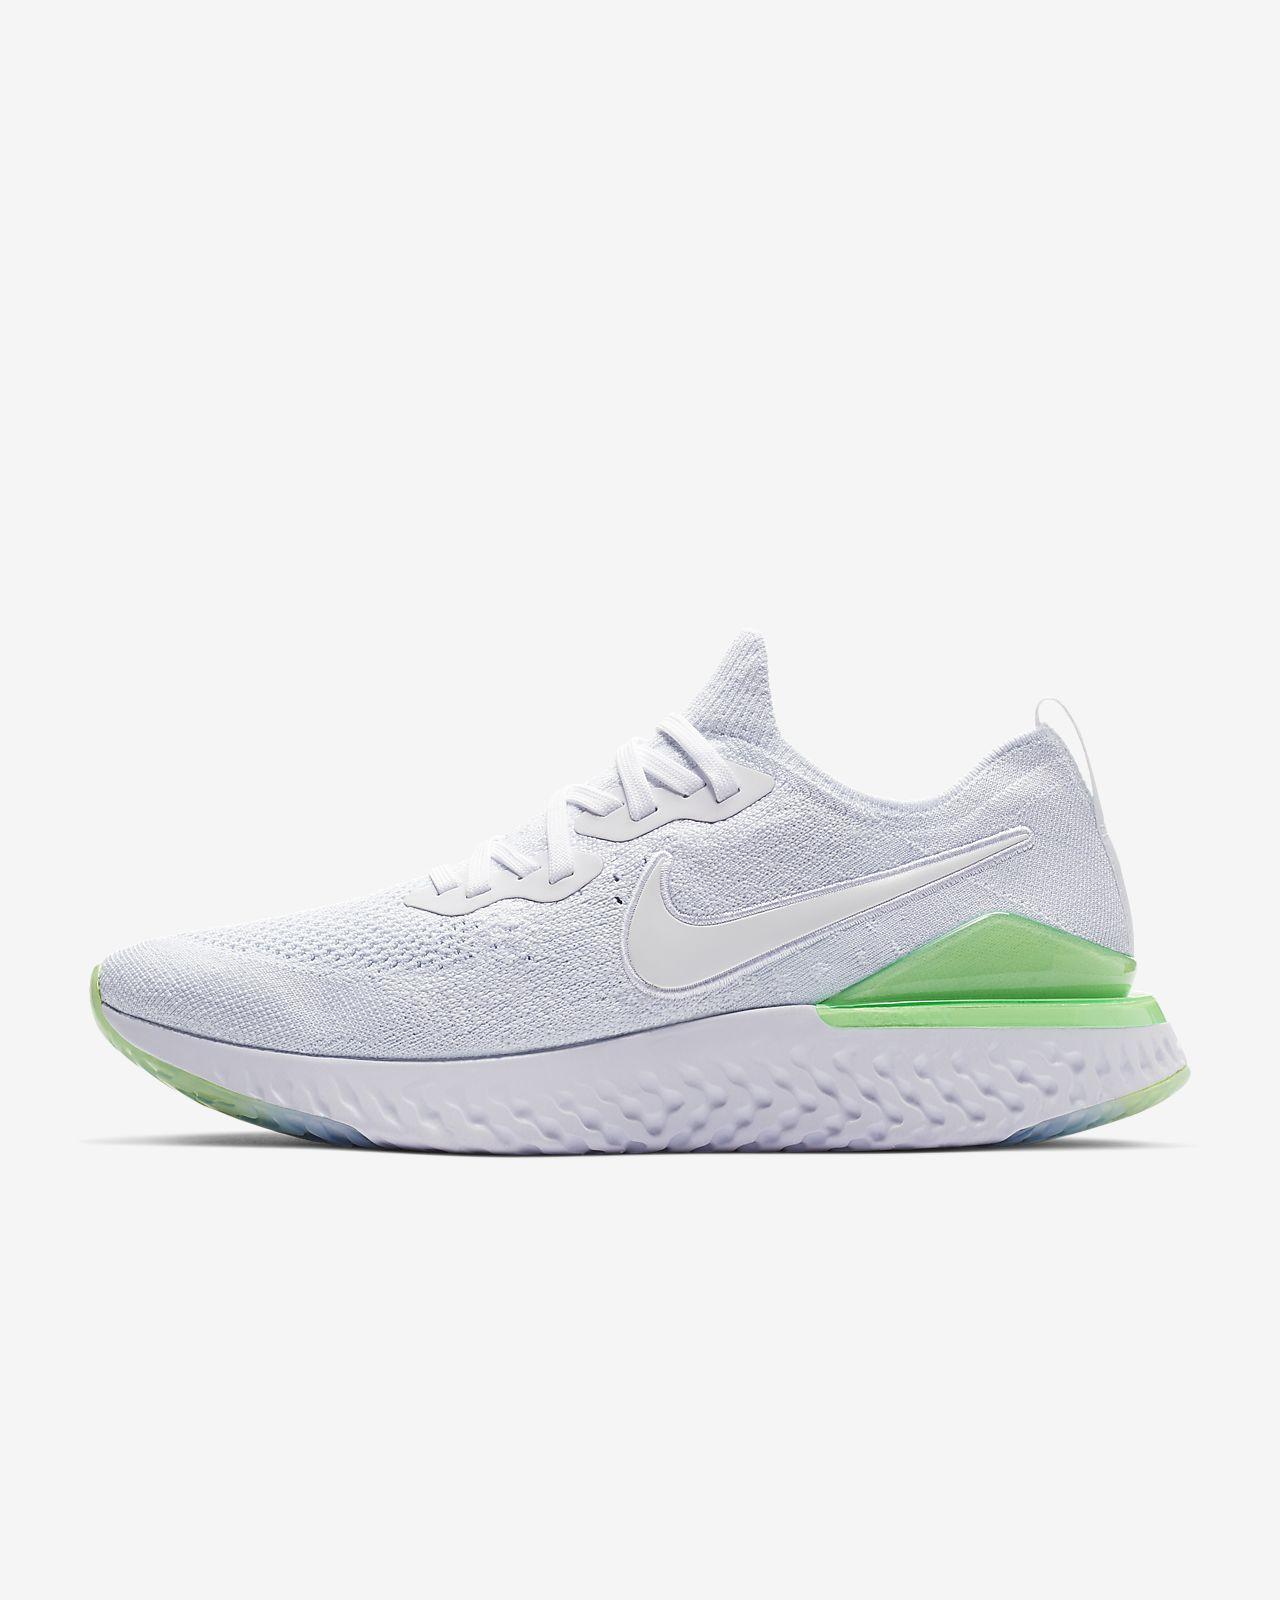 61153814f75301 Nike Epic React Flyknit 2 Men s Running Shoe. Nike.com AT